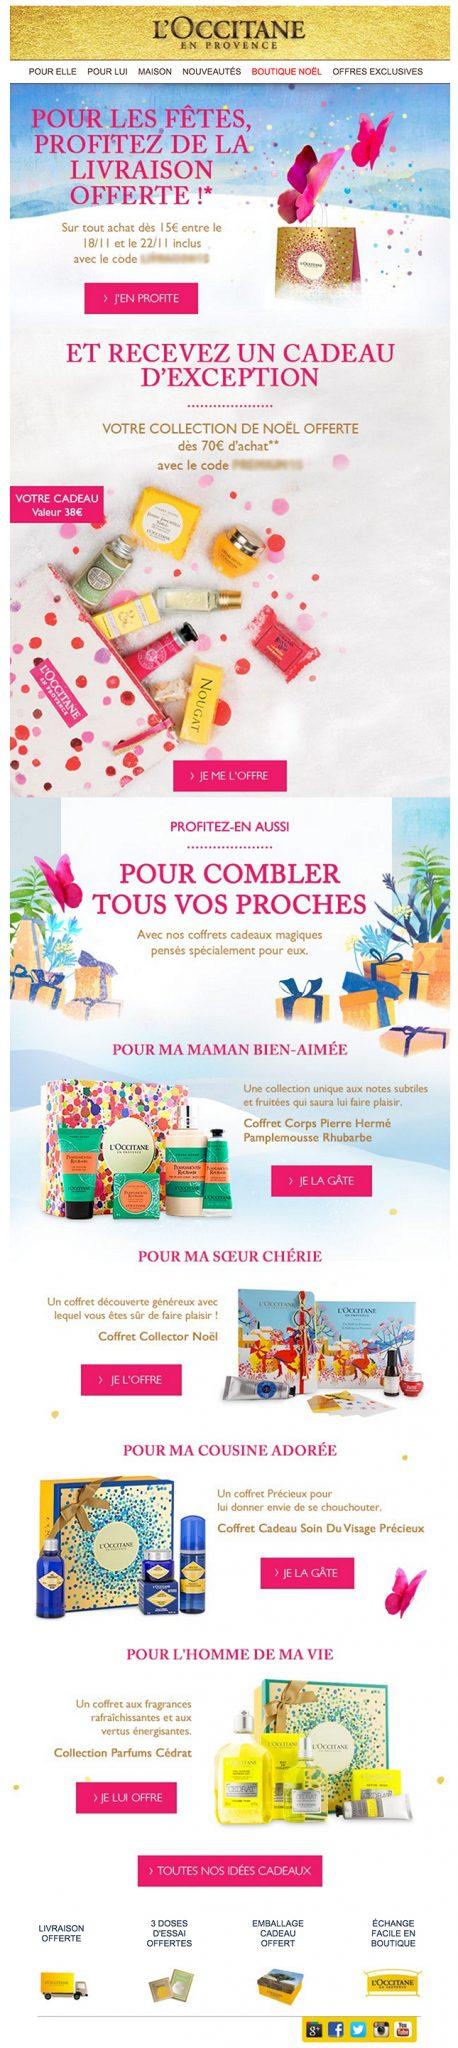 newsletter l'occitane en provence du 18 novembre 2015